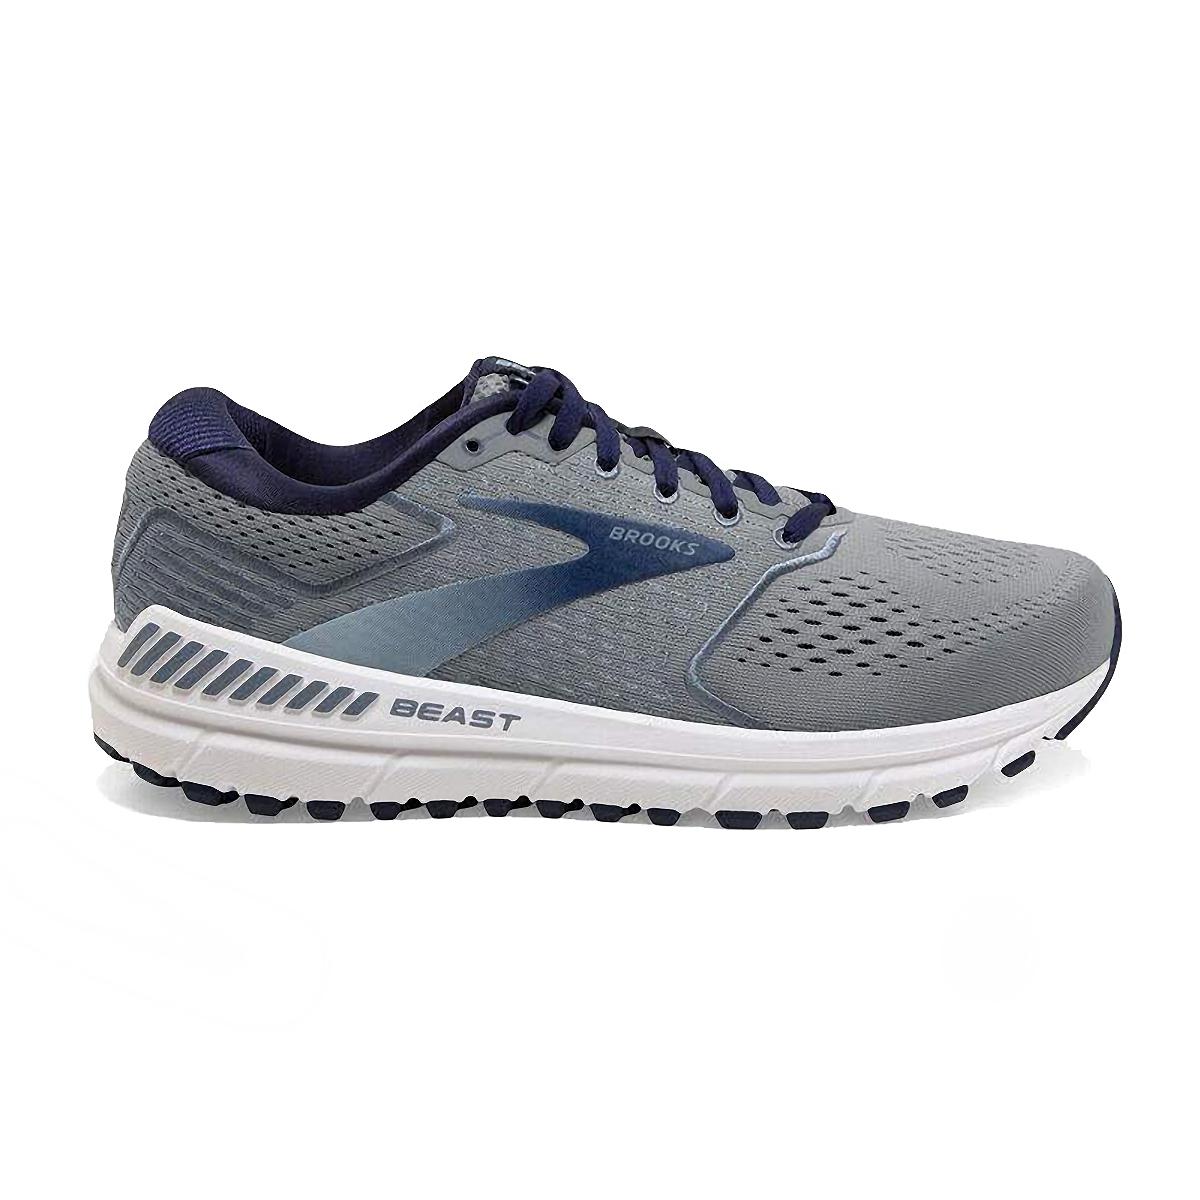 Men's Brooks Beast 20 Running Shoe - Color: Blue/Grey/Peacoat (Regular Width) - Size: 8, Blue/Grey/Peacoat, large, image 1